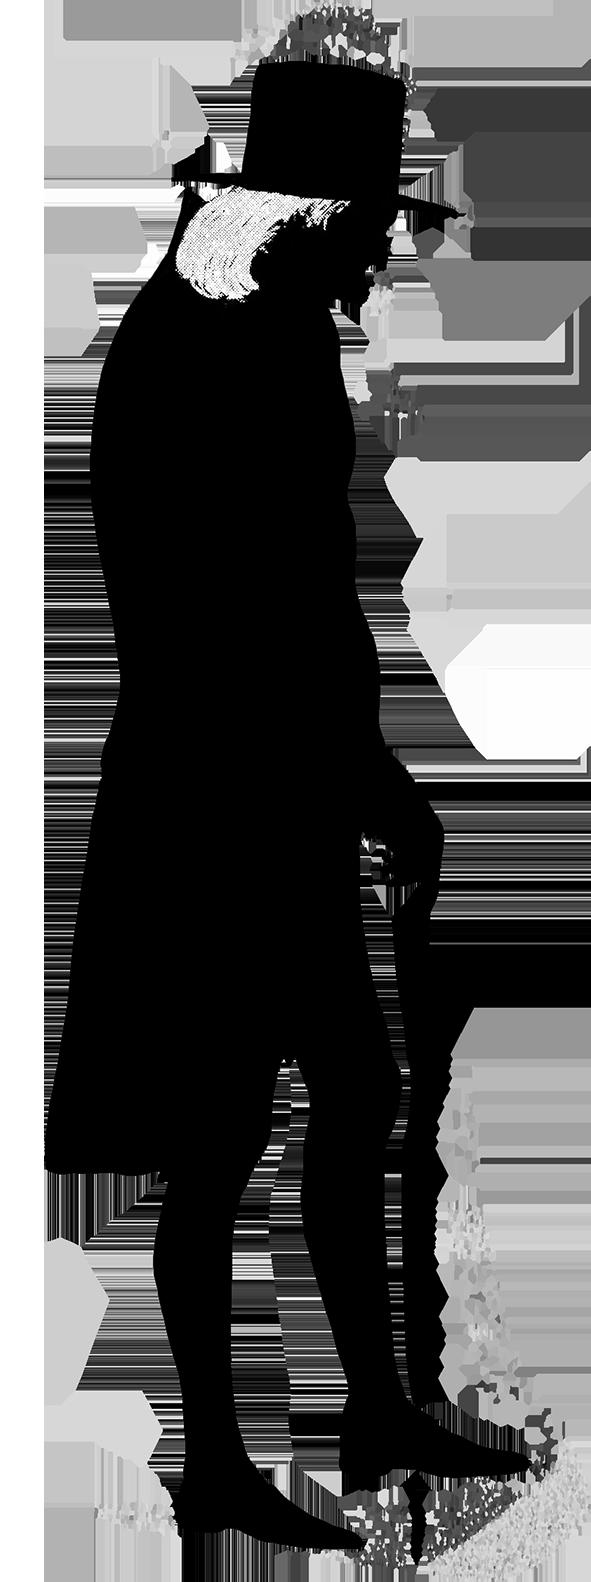 591x1582 Clipart Silhouette Elderly